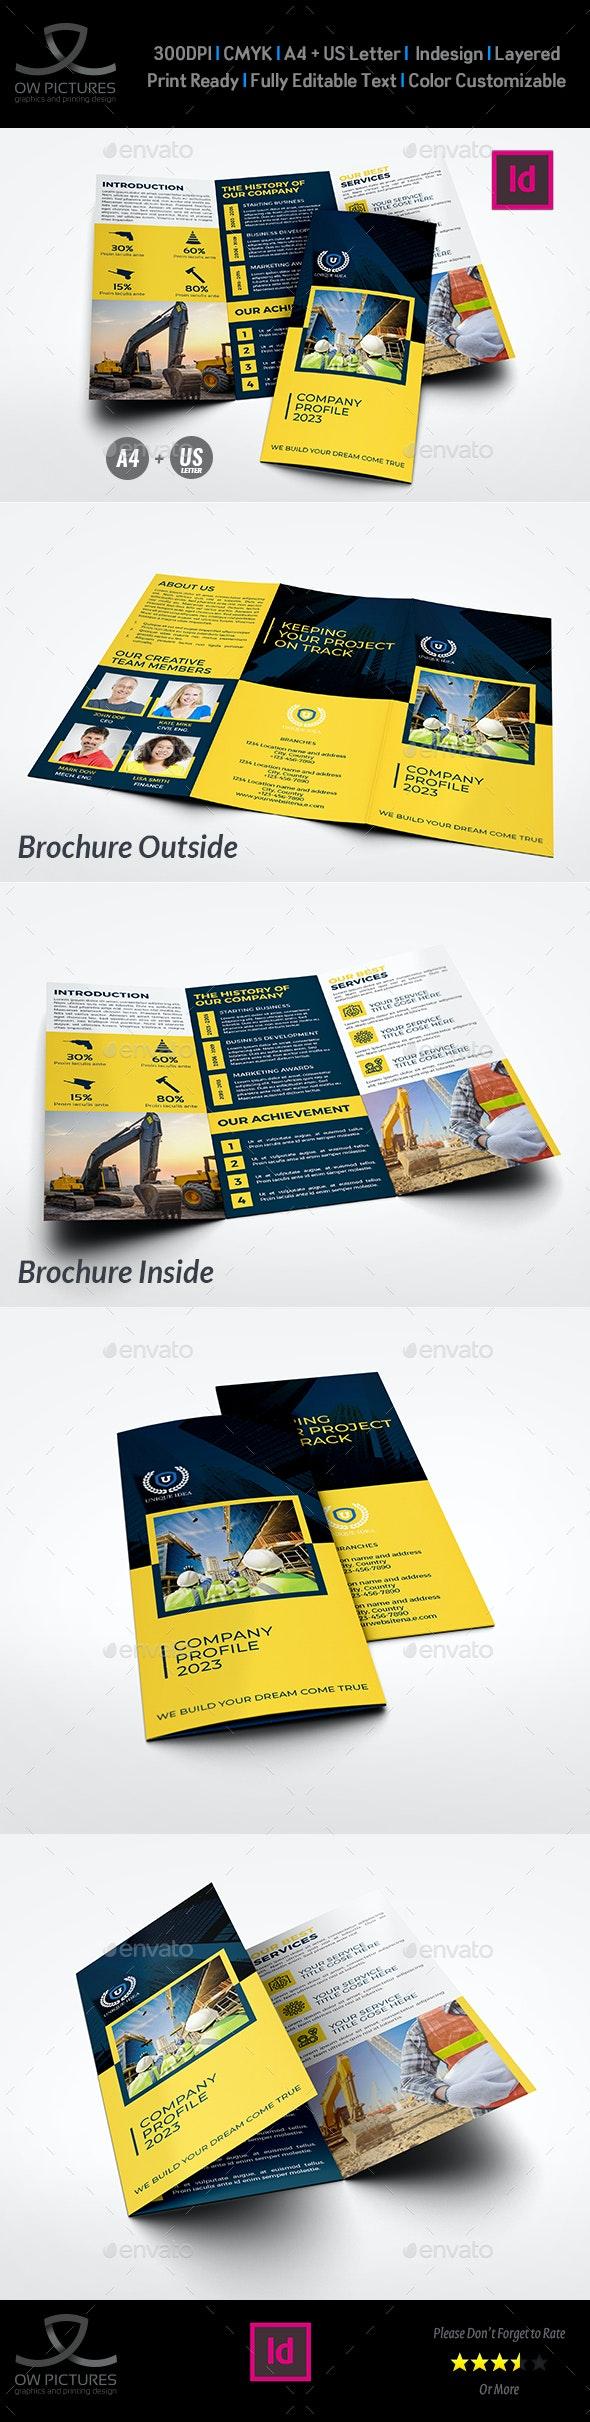 Construction Company Profile Tri-Fold Brochure Template - Brochures Print Templates